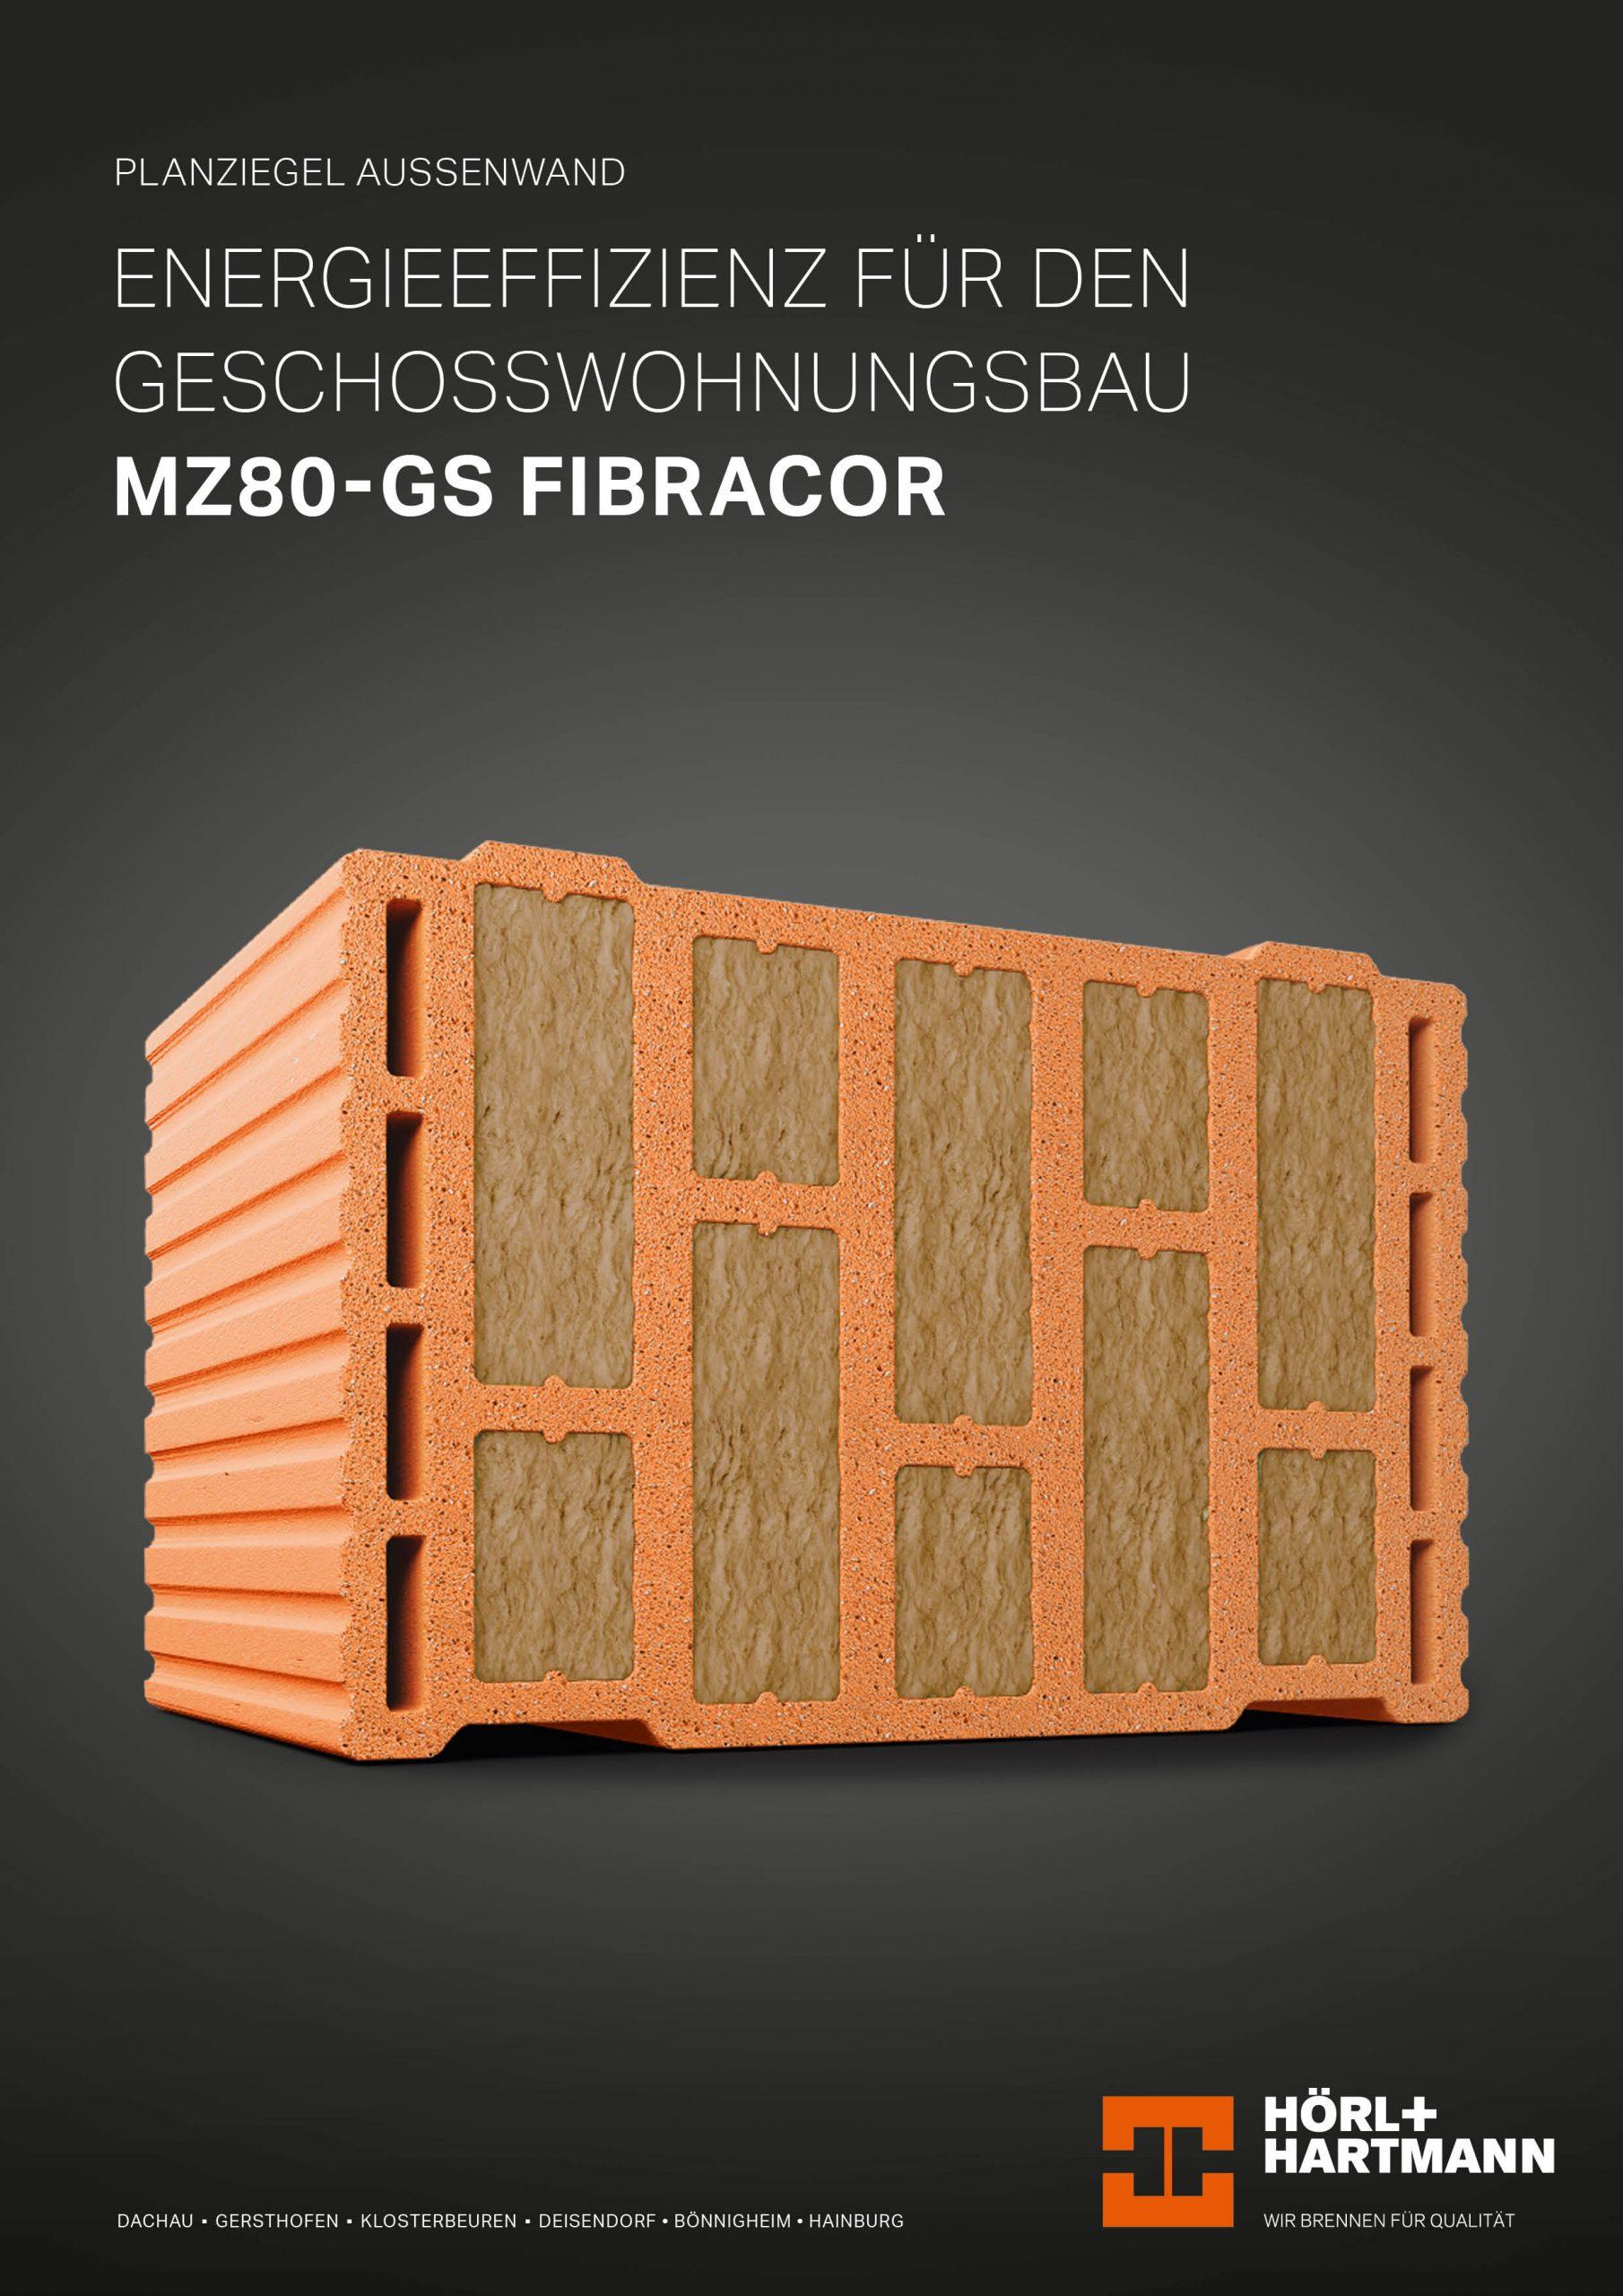 Datenblatt MZ80-GS FIBRACOR